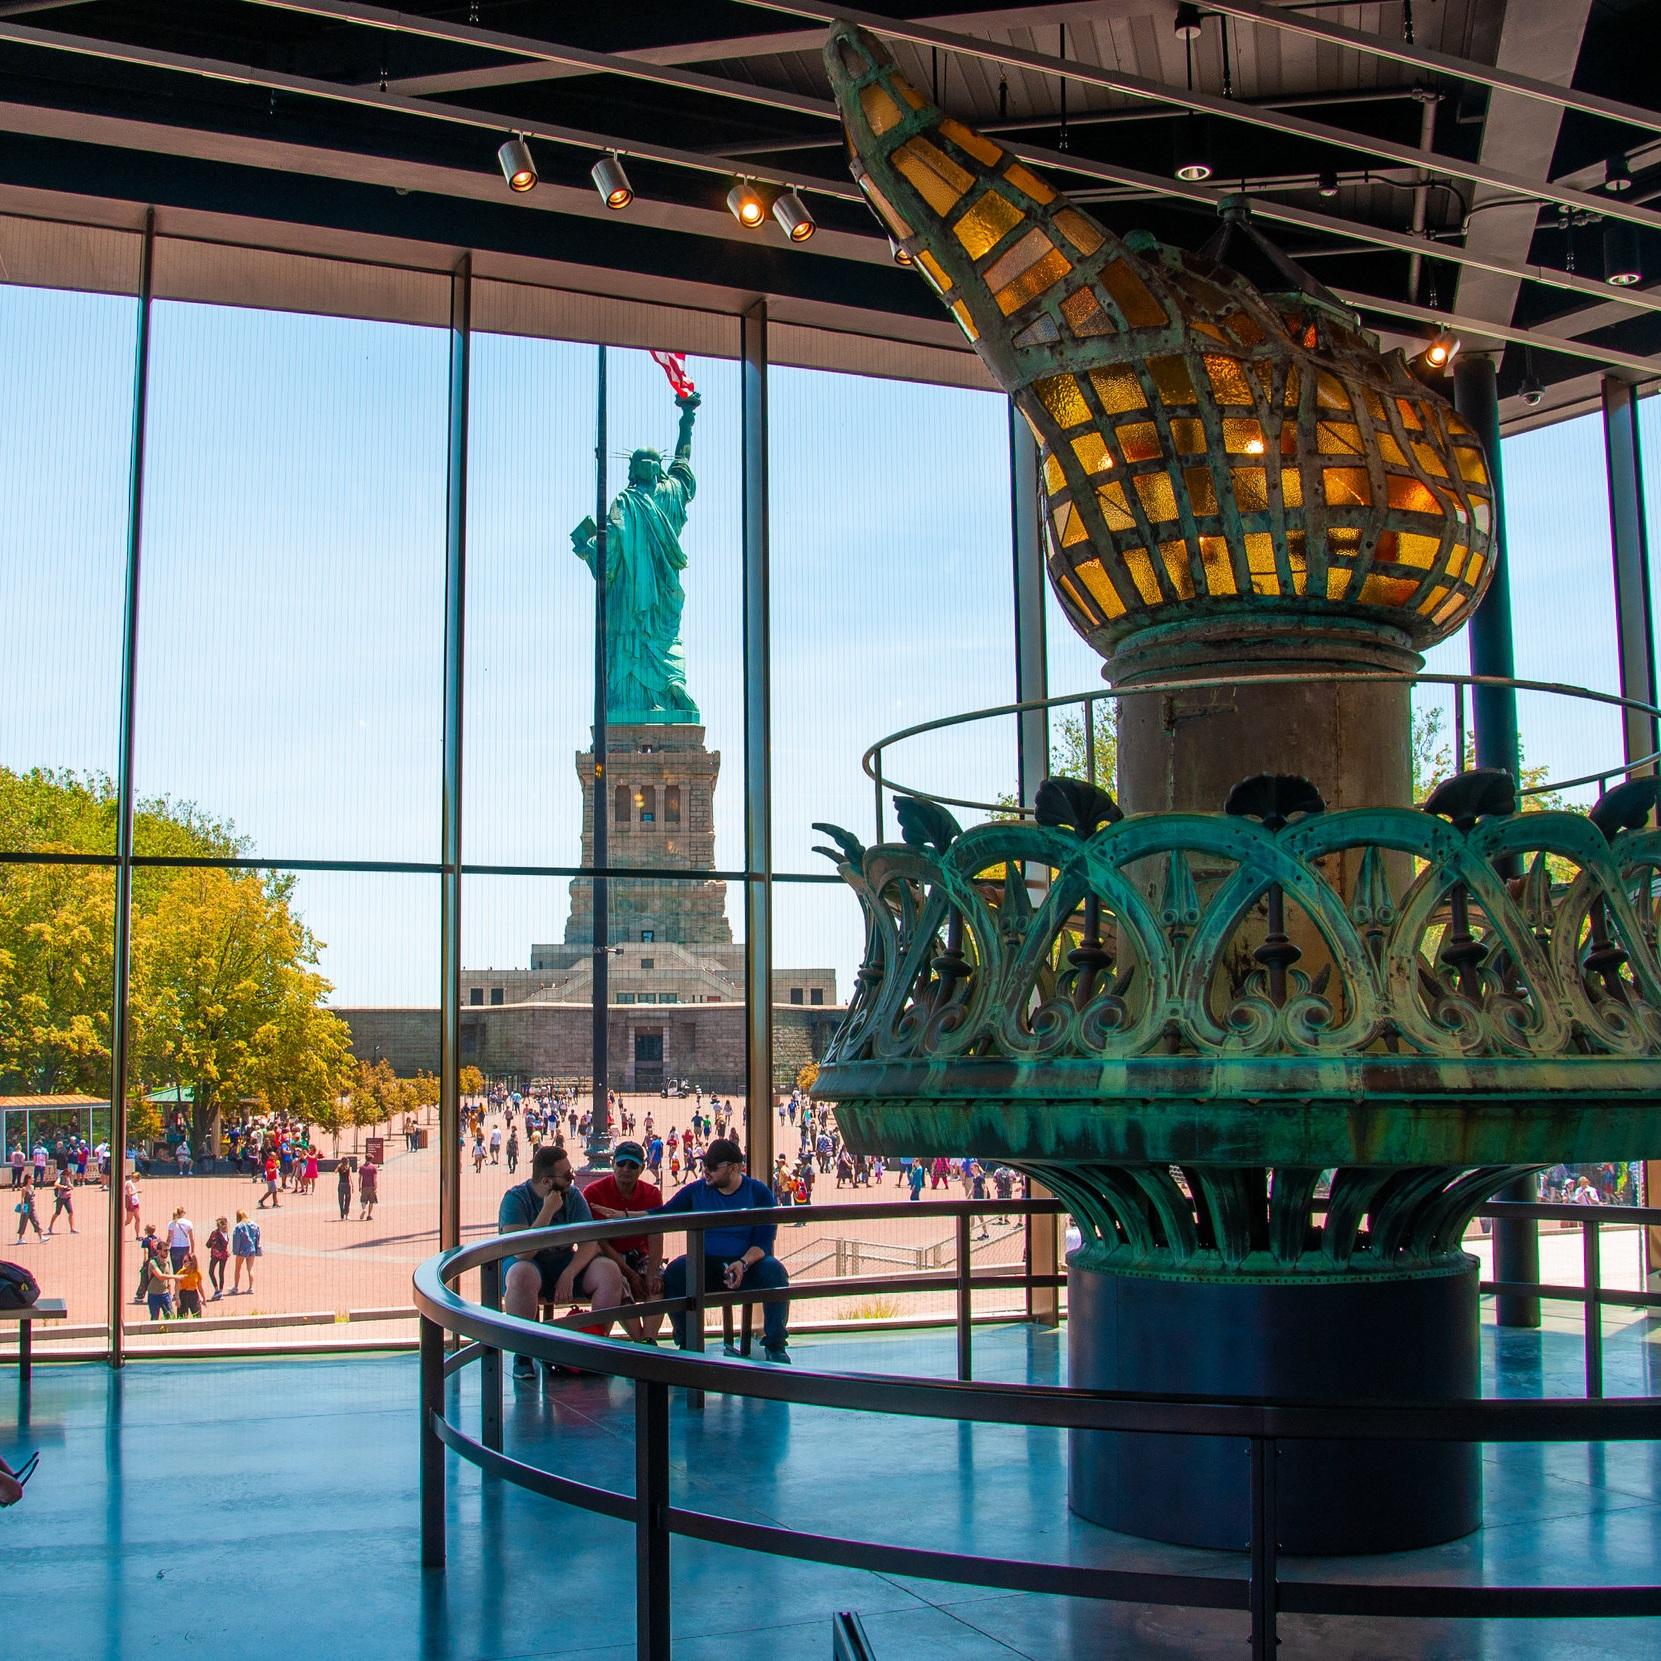 statue of liberty museum - Liberty Island, NY